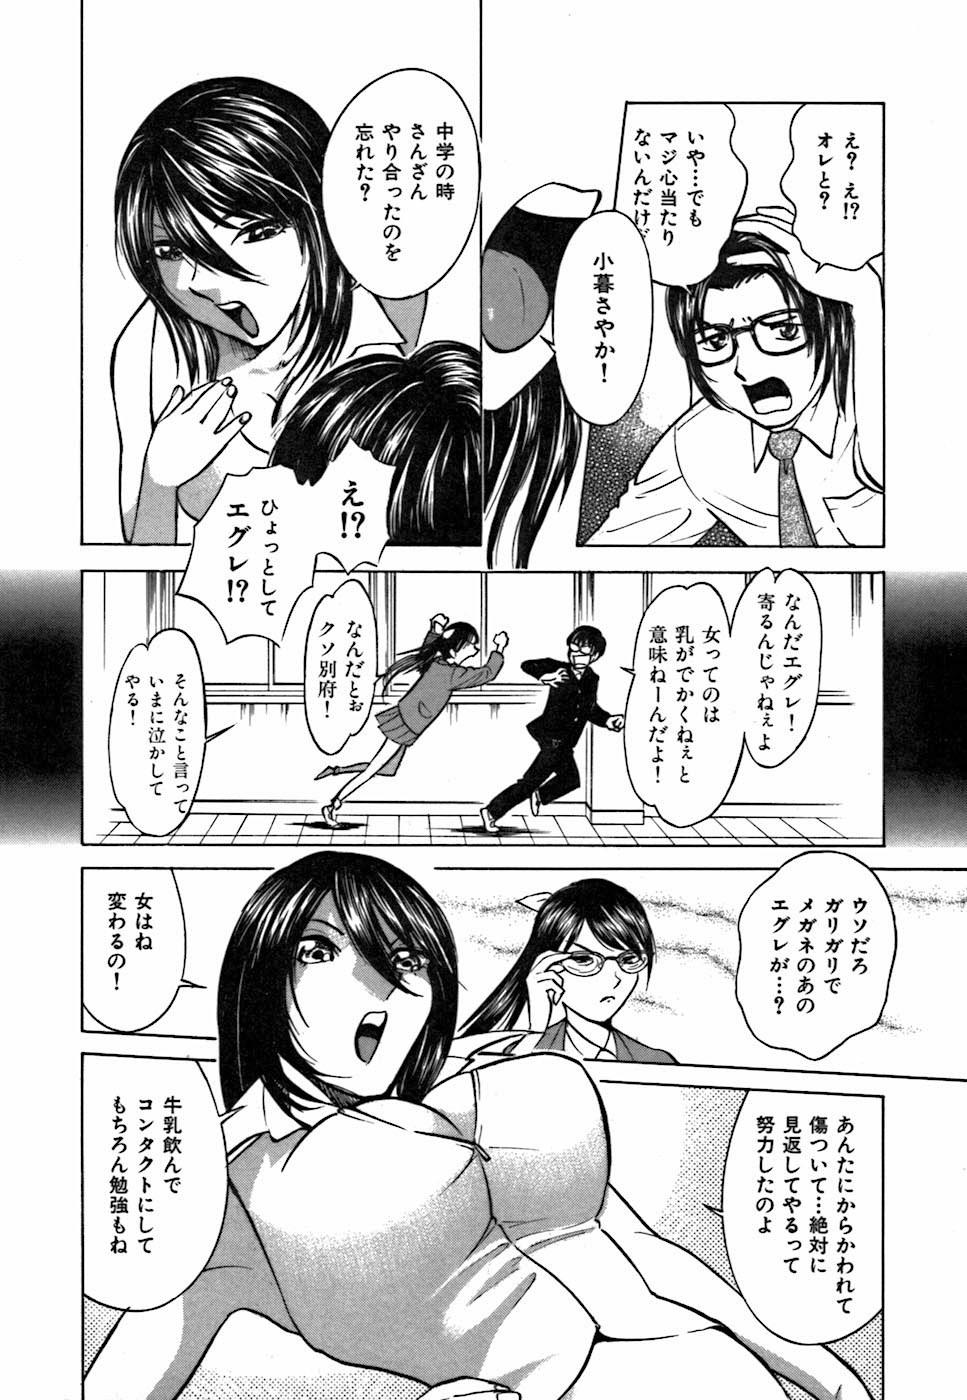 Kimi ga Nozomu Katachi | Appearance for which you hope 11